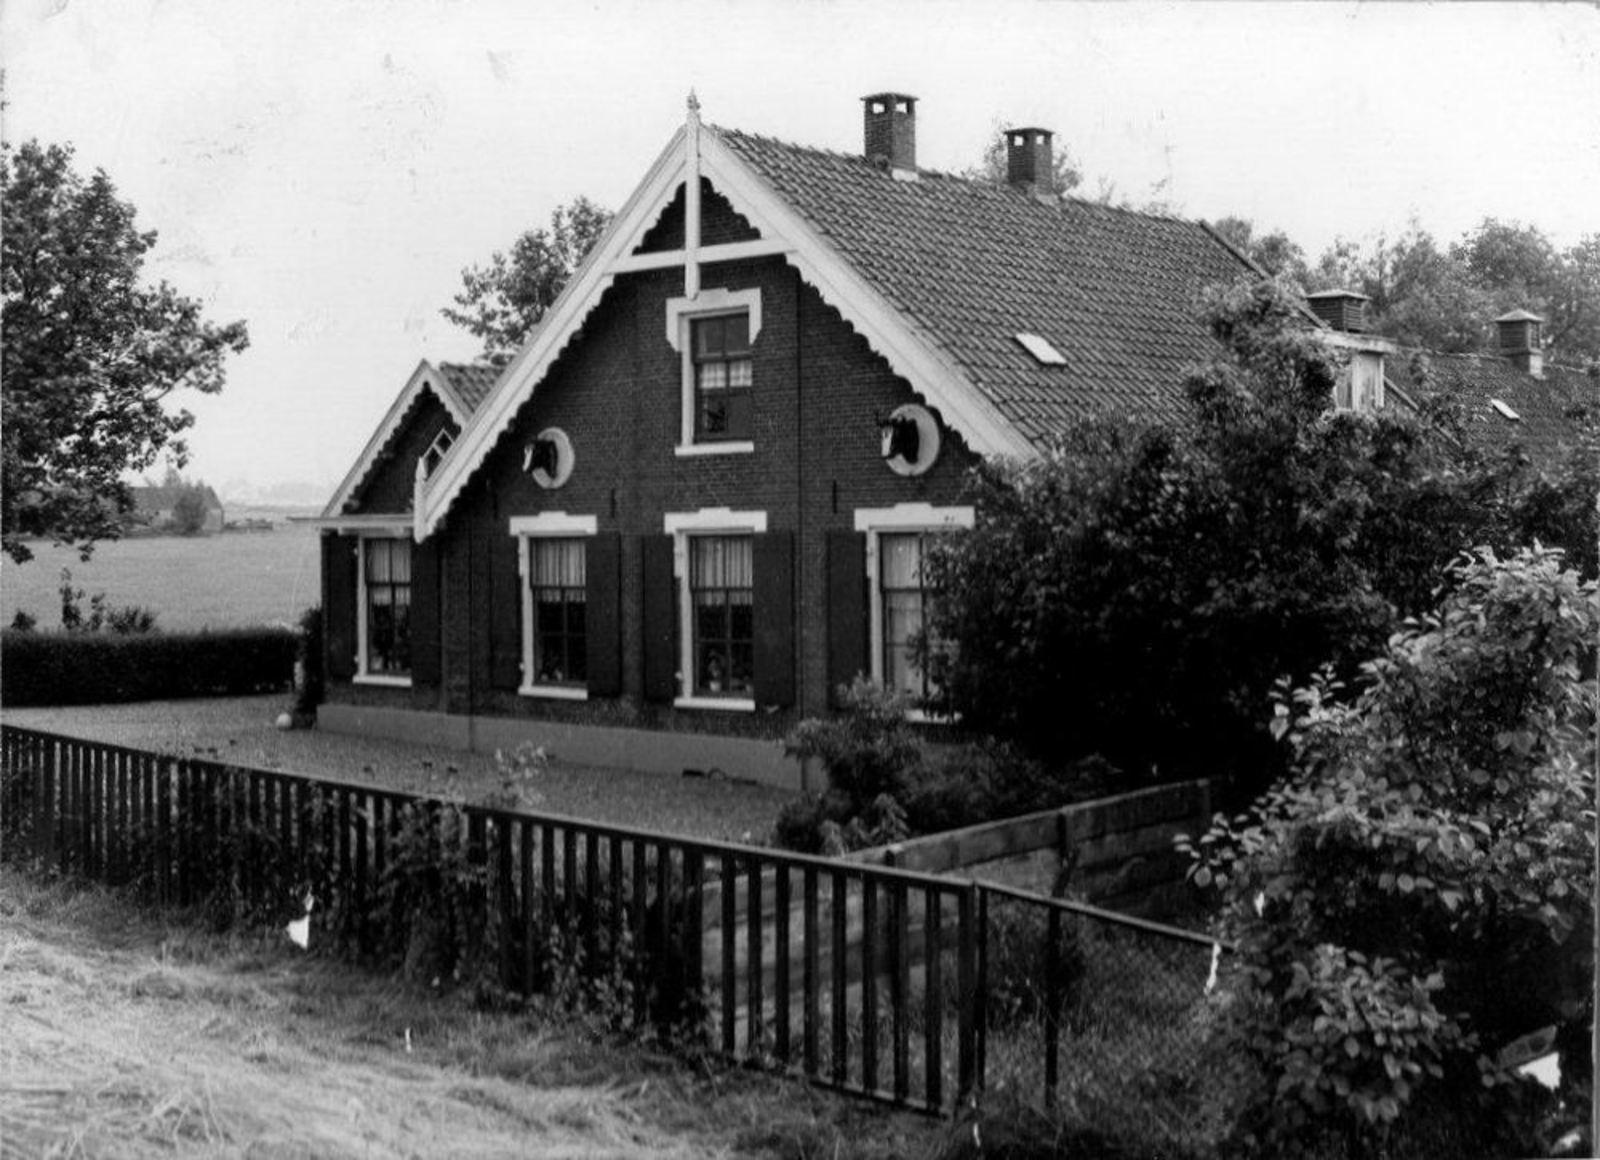 Aalsmeer Onbekend Boerderij met Koeienkoppen